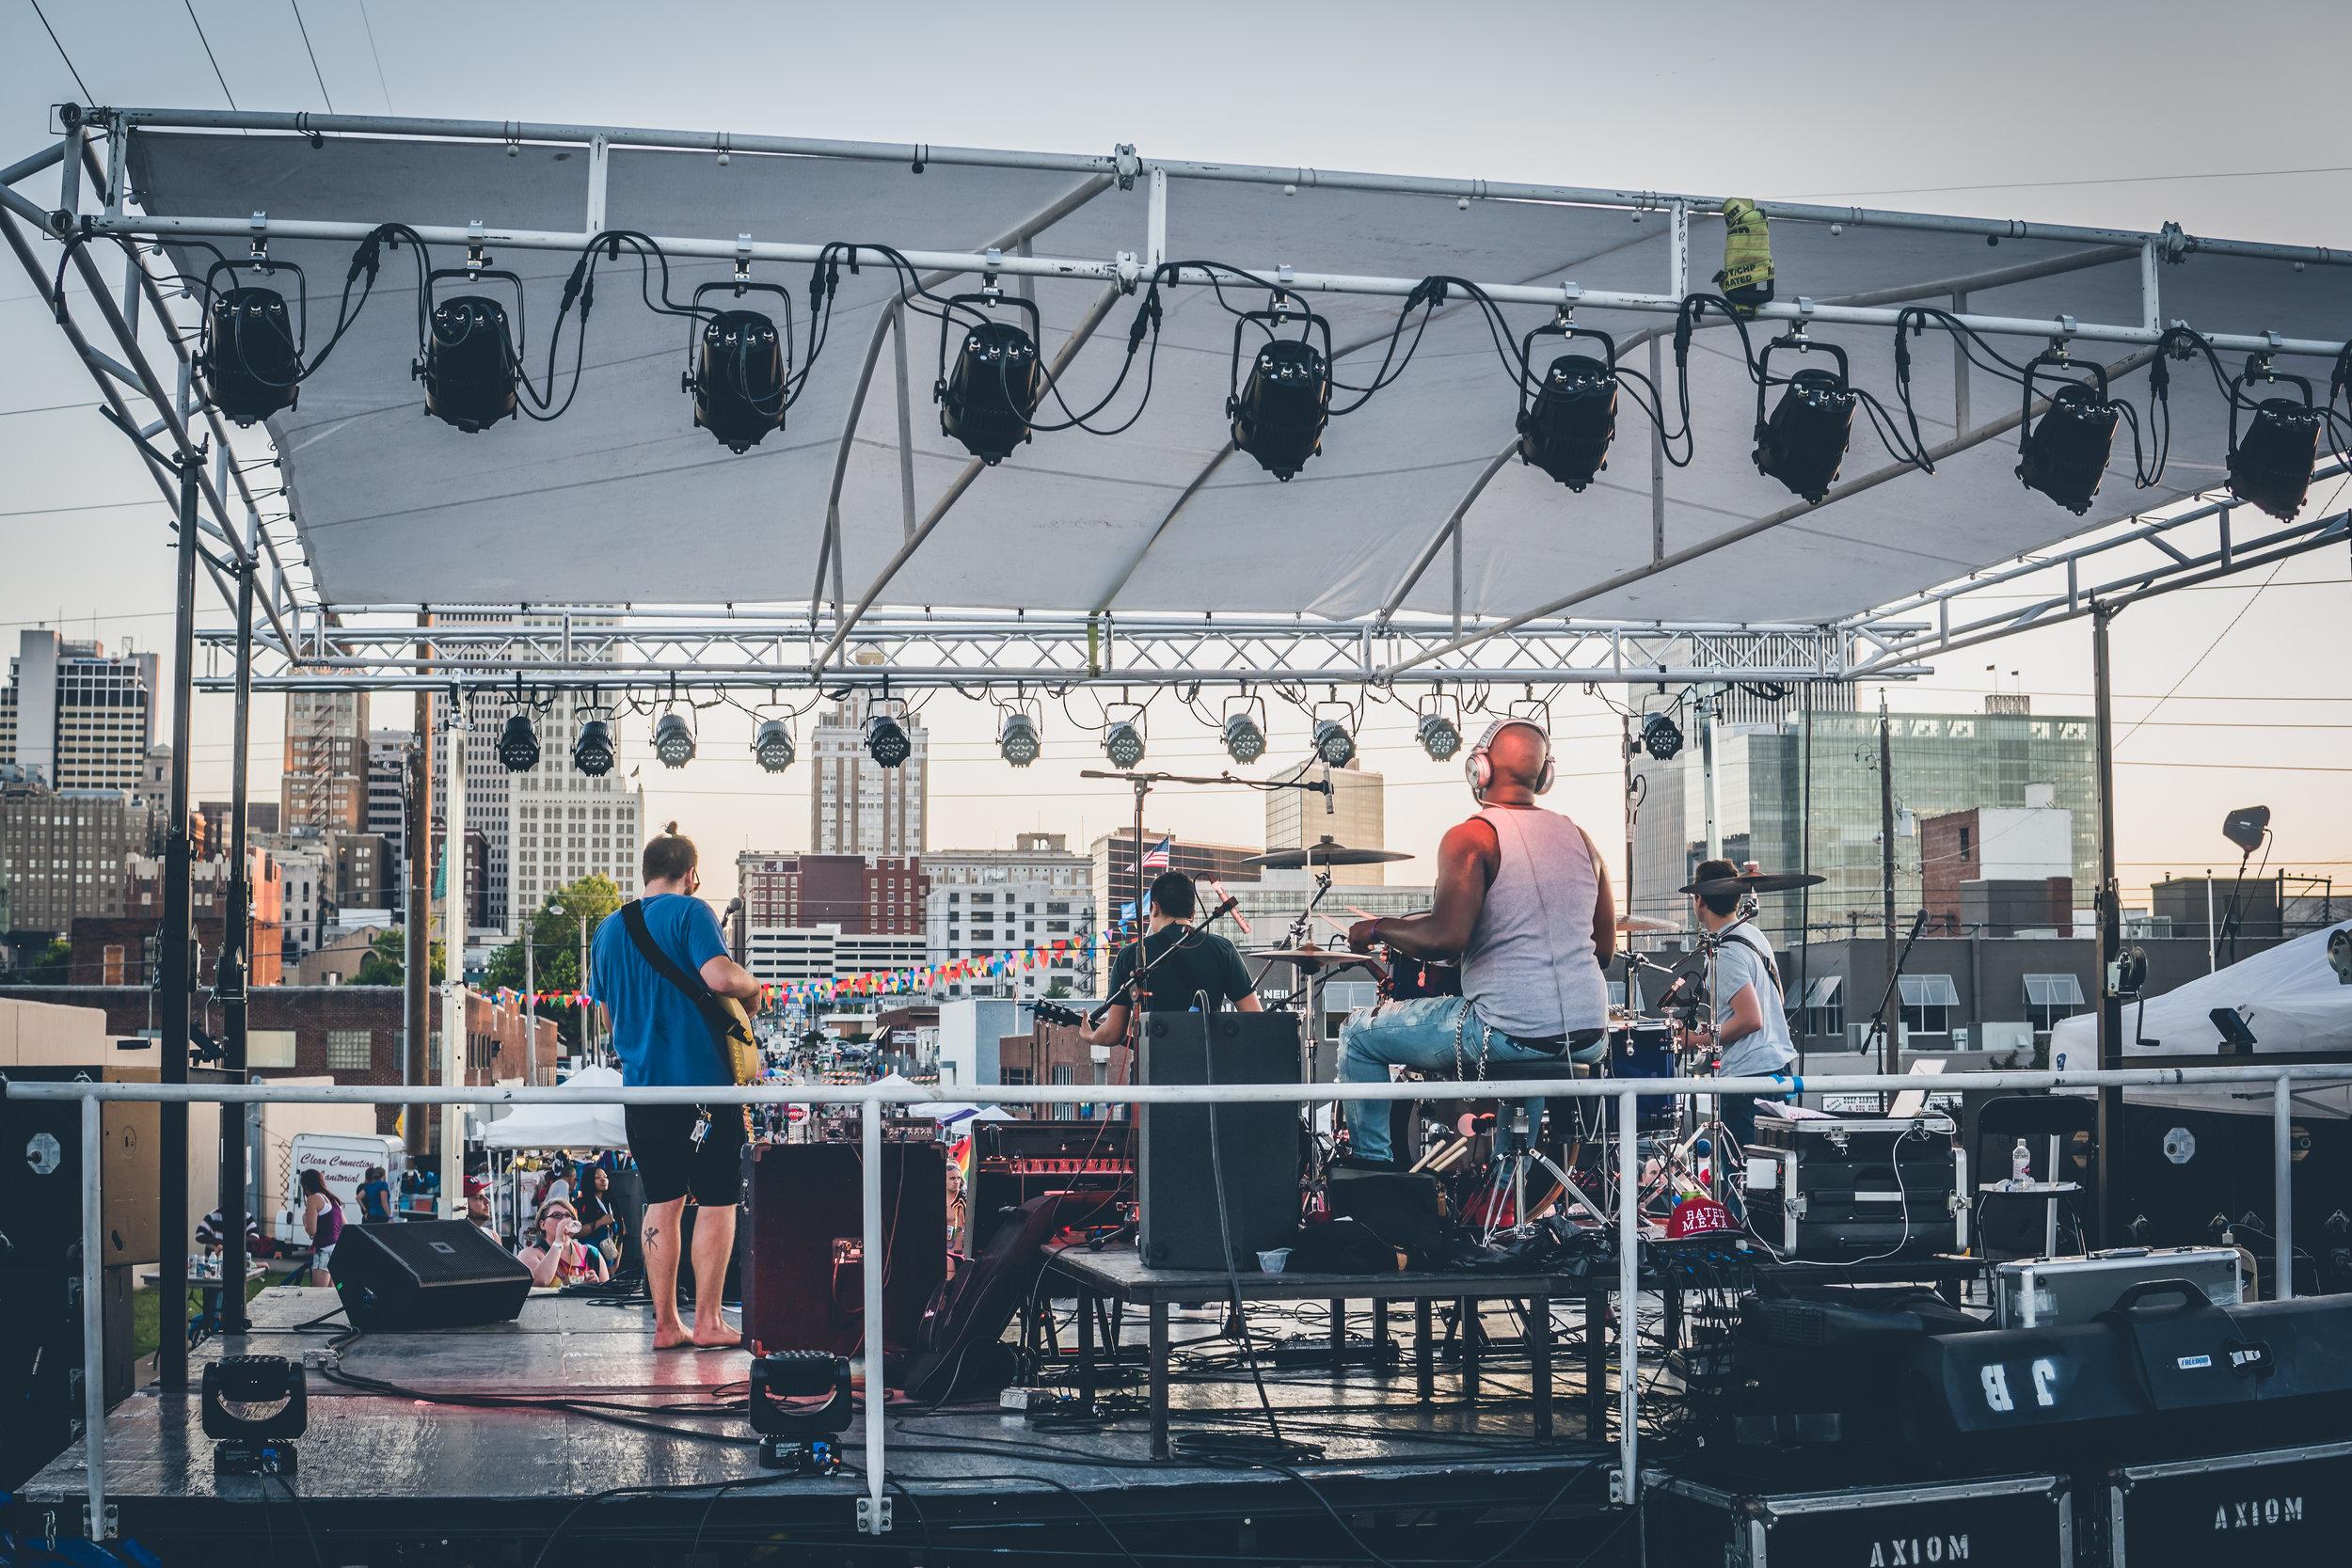 FM Pilots - Tulsa Rock Band - Tulsa Pride Fest Tulsa, OK 060416-15.jpg